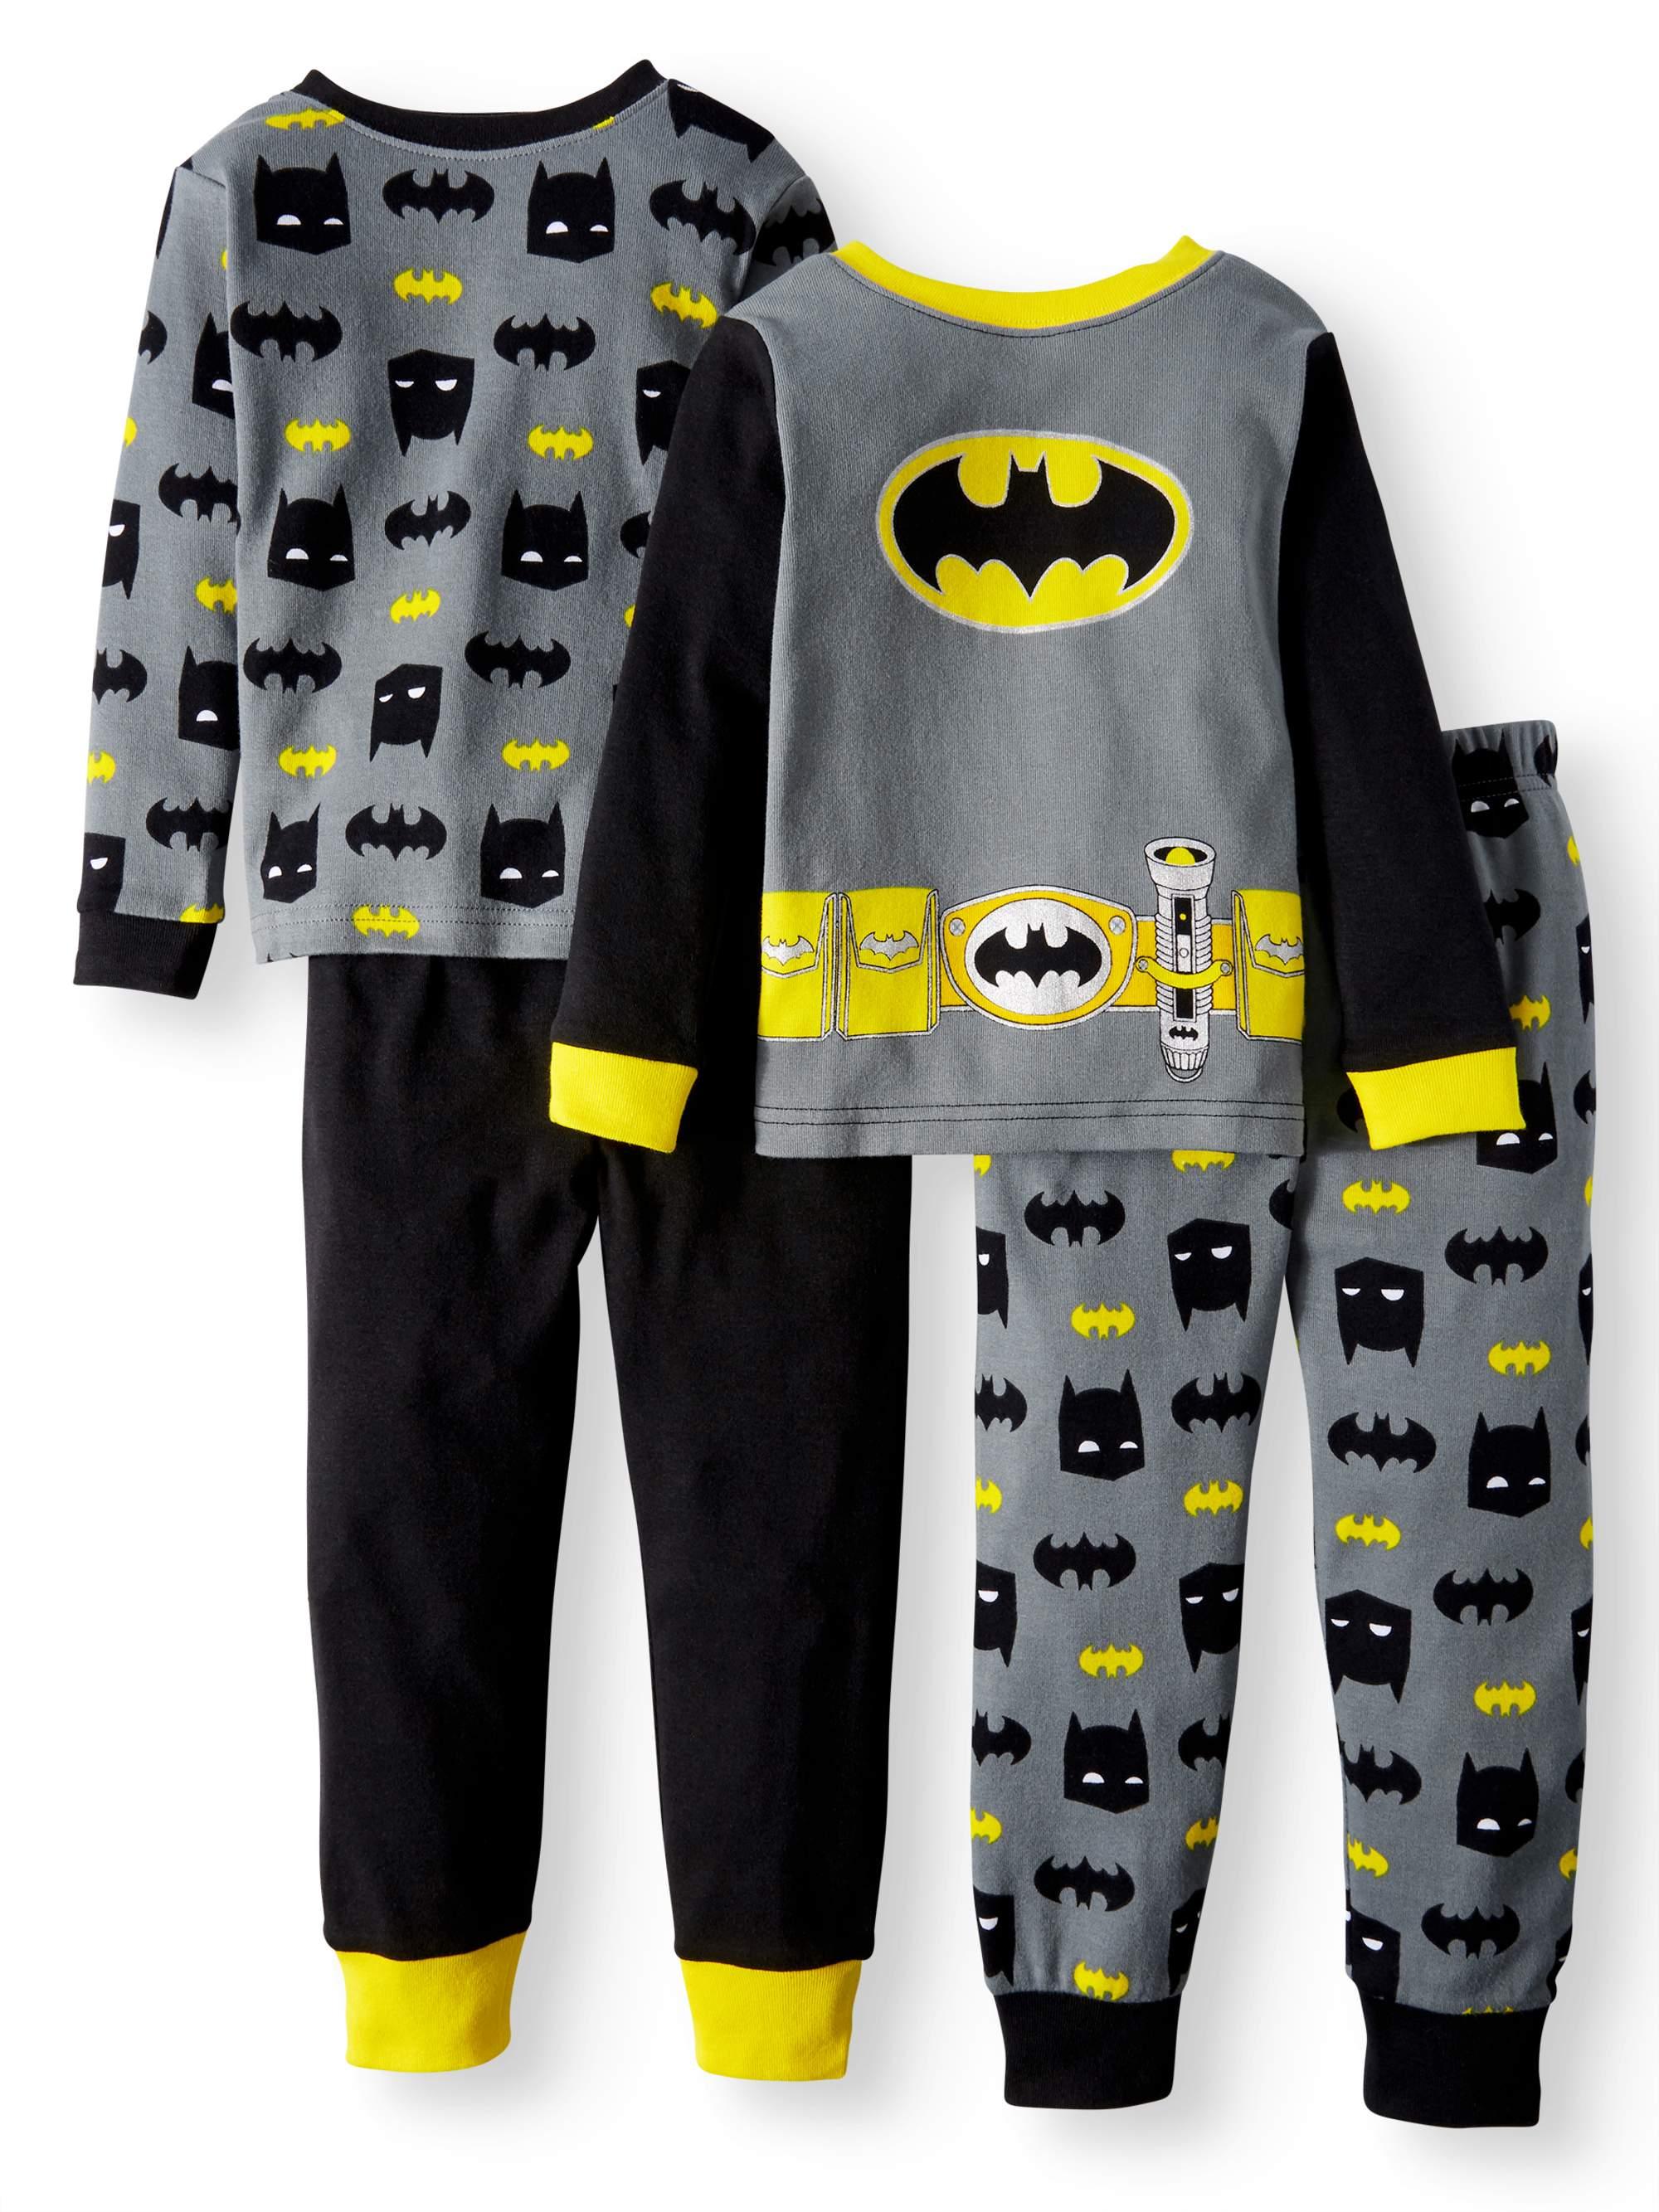 Cotton Tight Fit Pajamas, 4-piece Set (Toddler Boys)